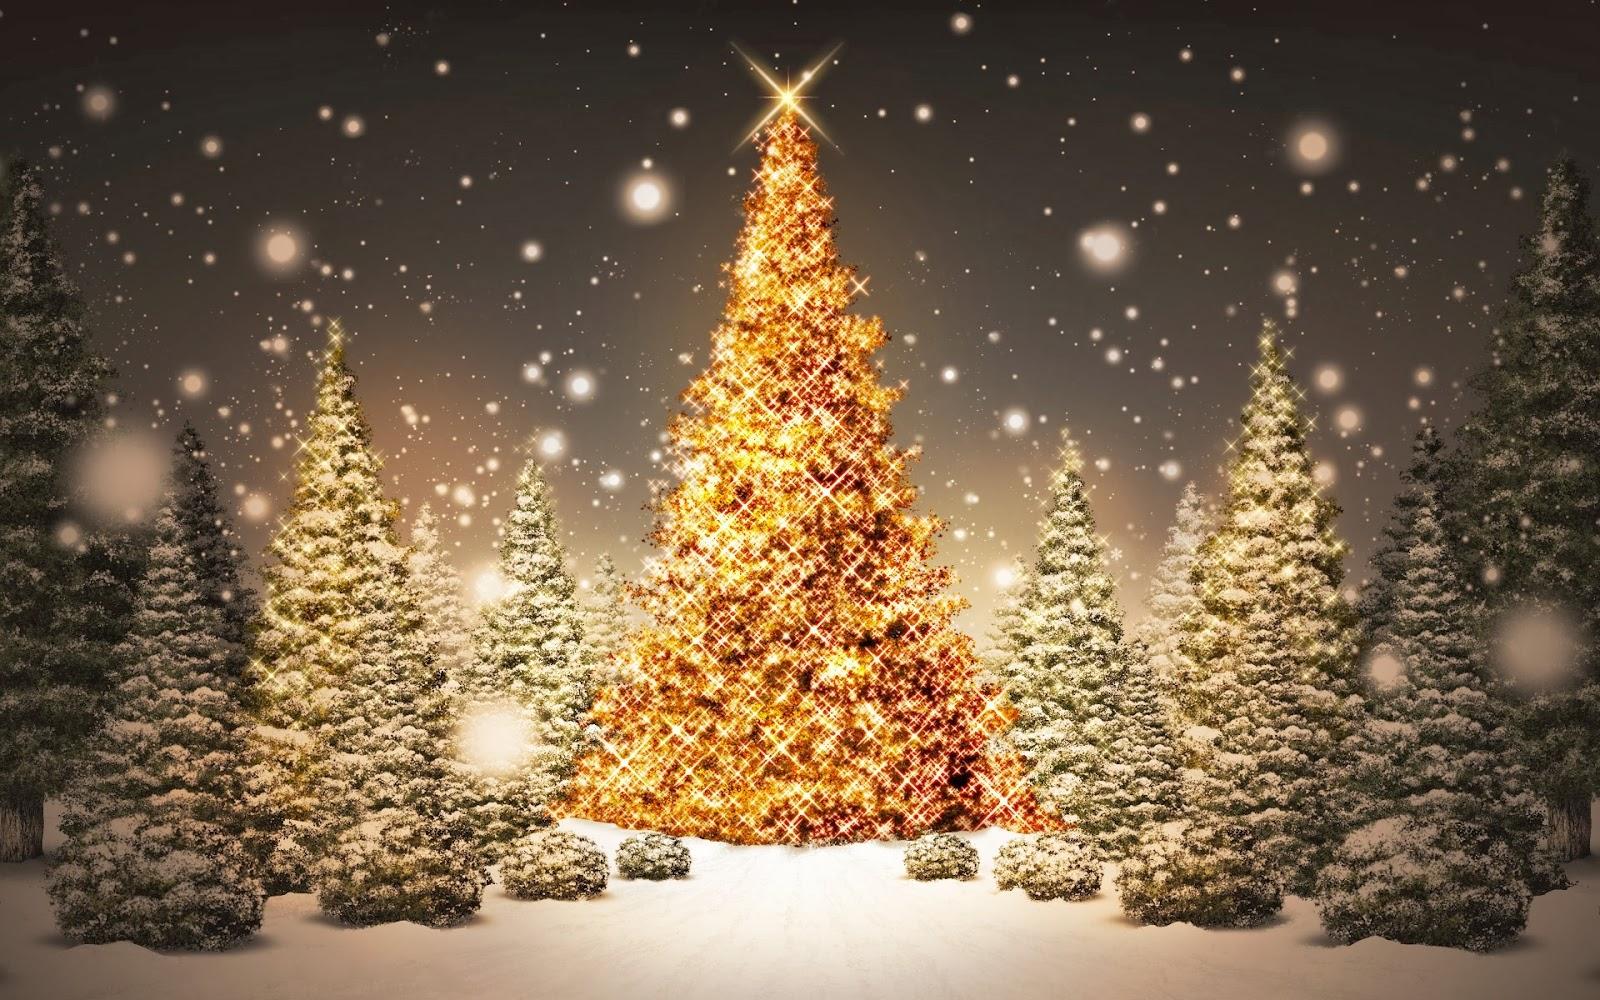 3d Christmas Tree For Desktop HD Wallpaper Free